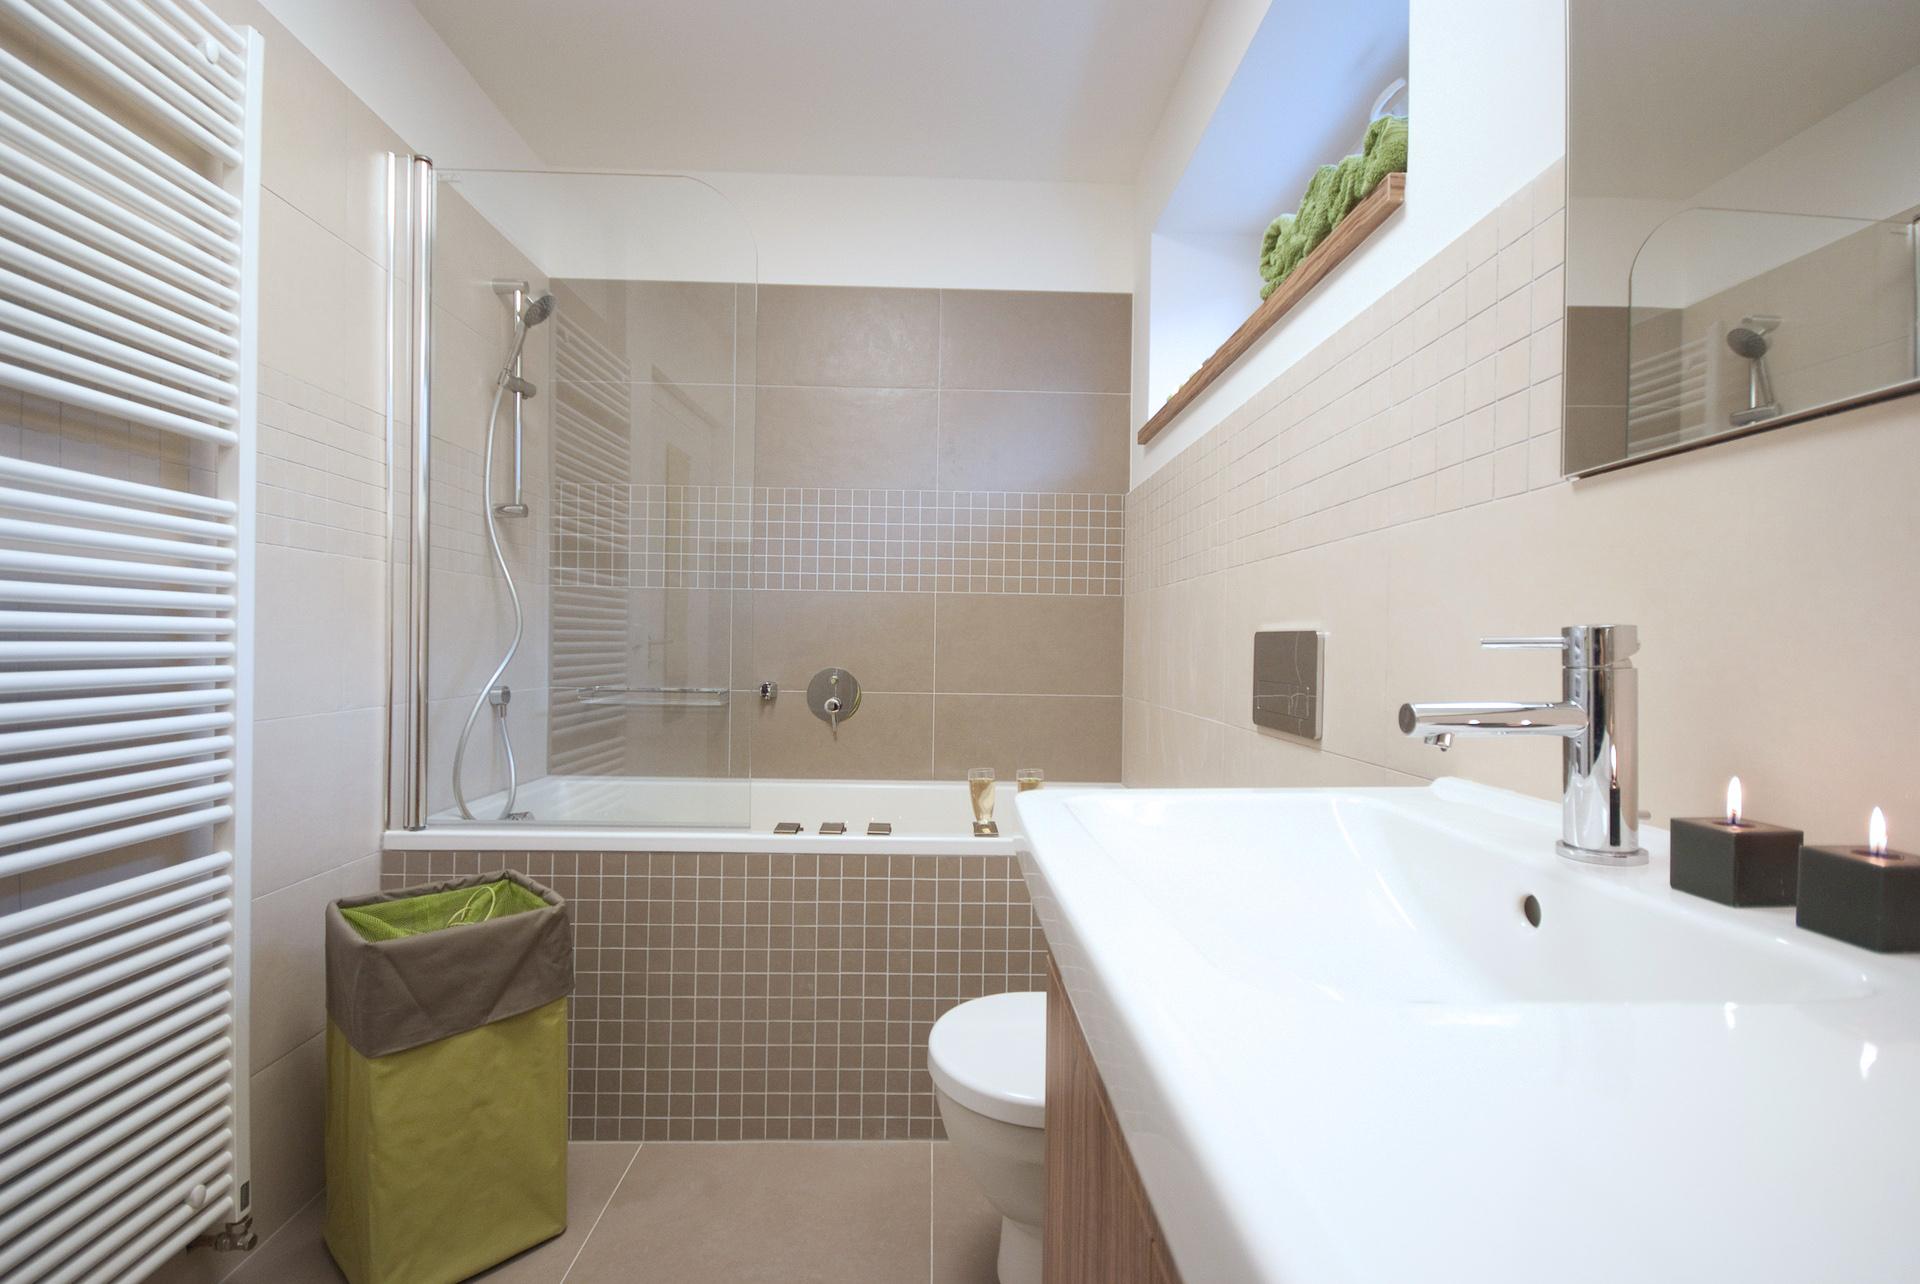 jak se staví sen - koupelna Beroun 2